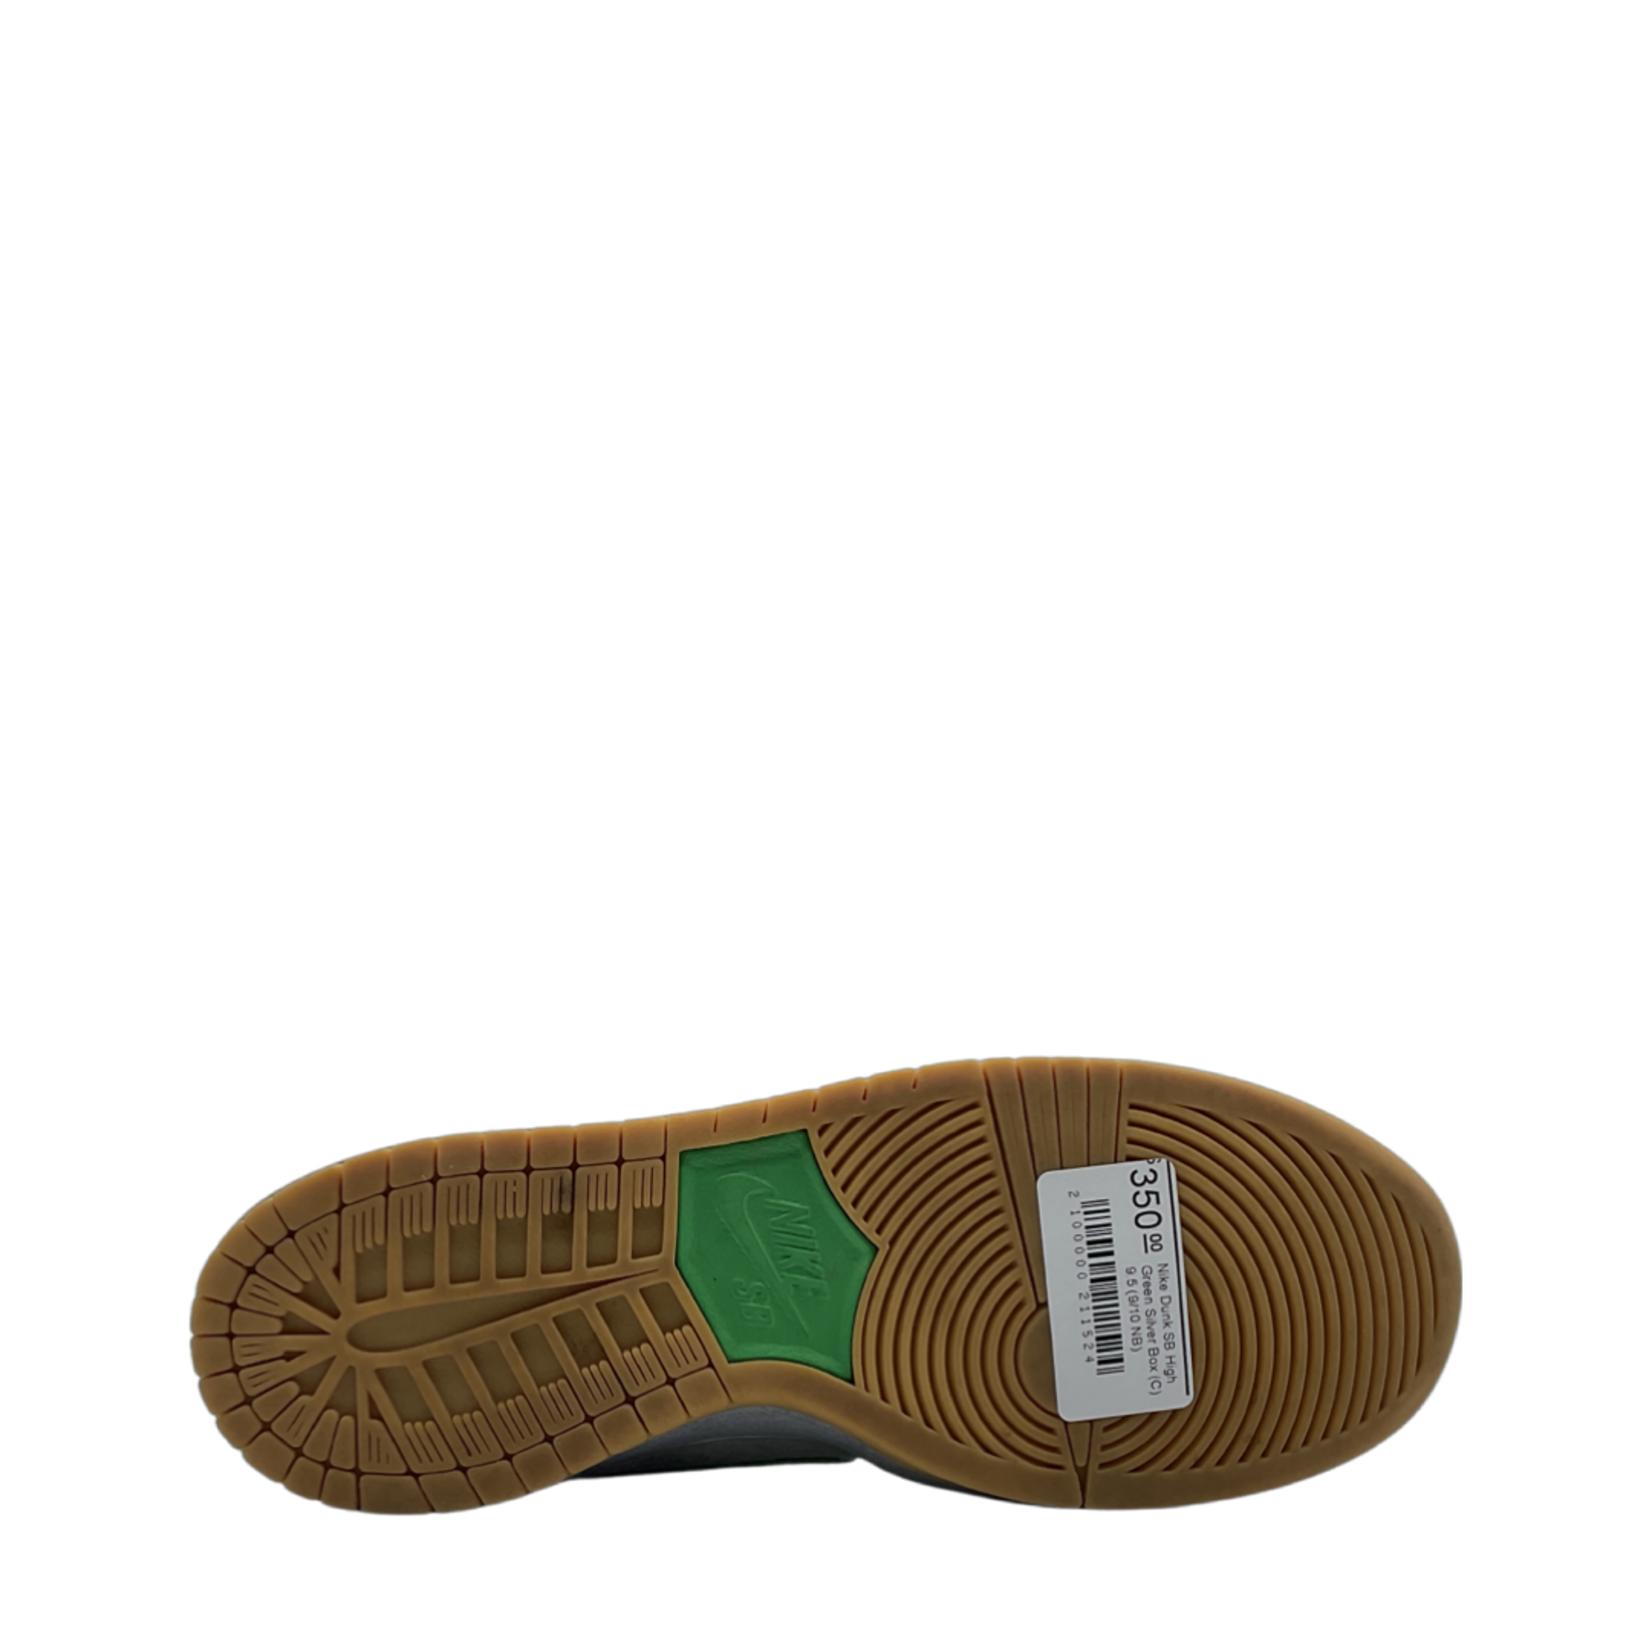 Nike Nike Dunk SB High Green Silver Box (C)